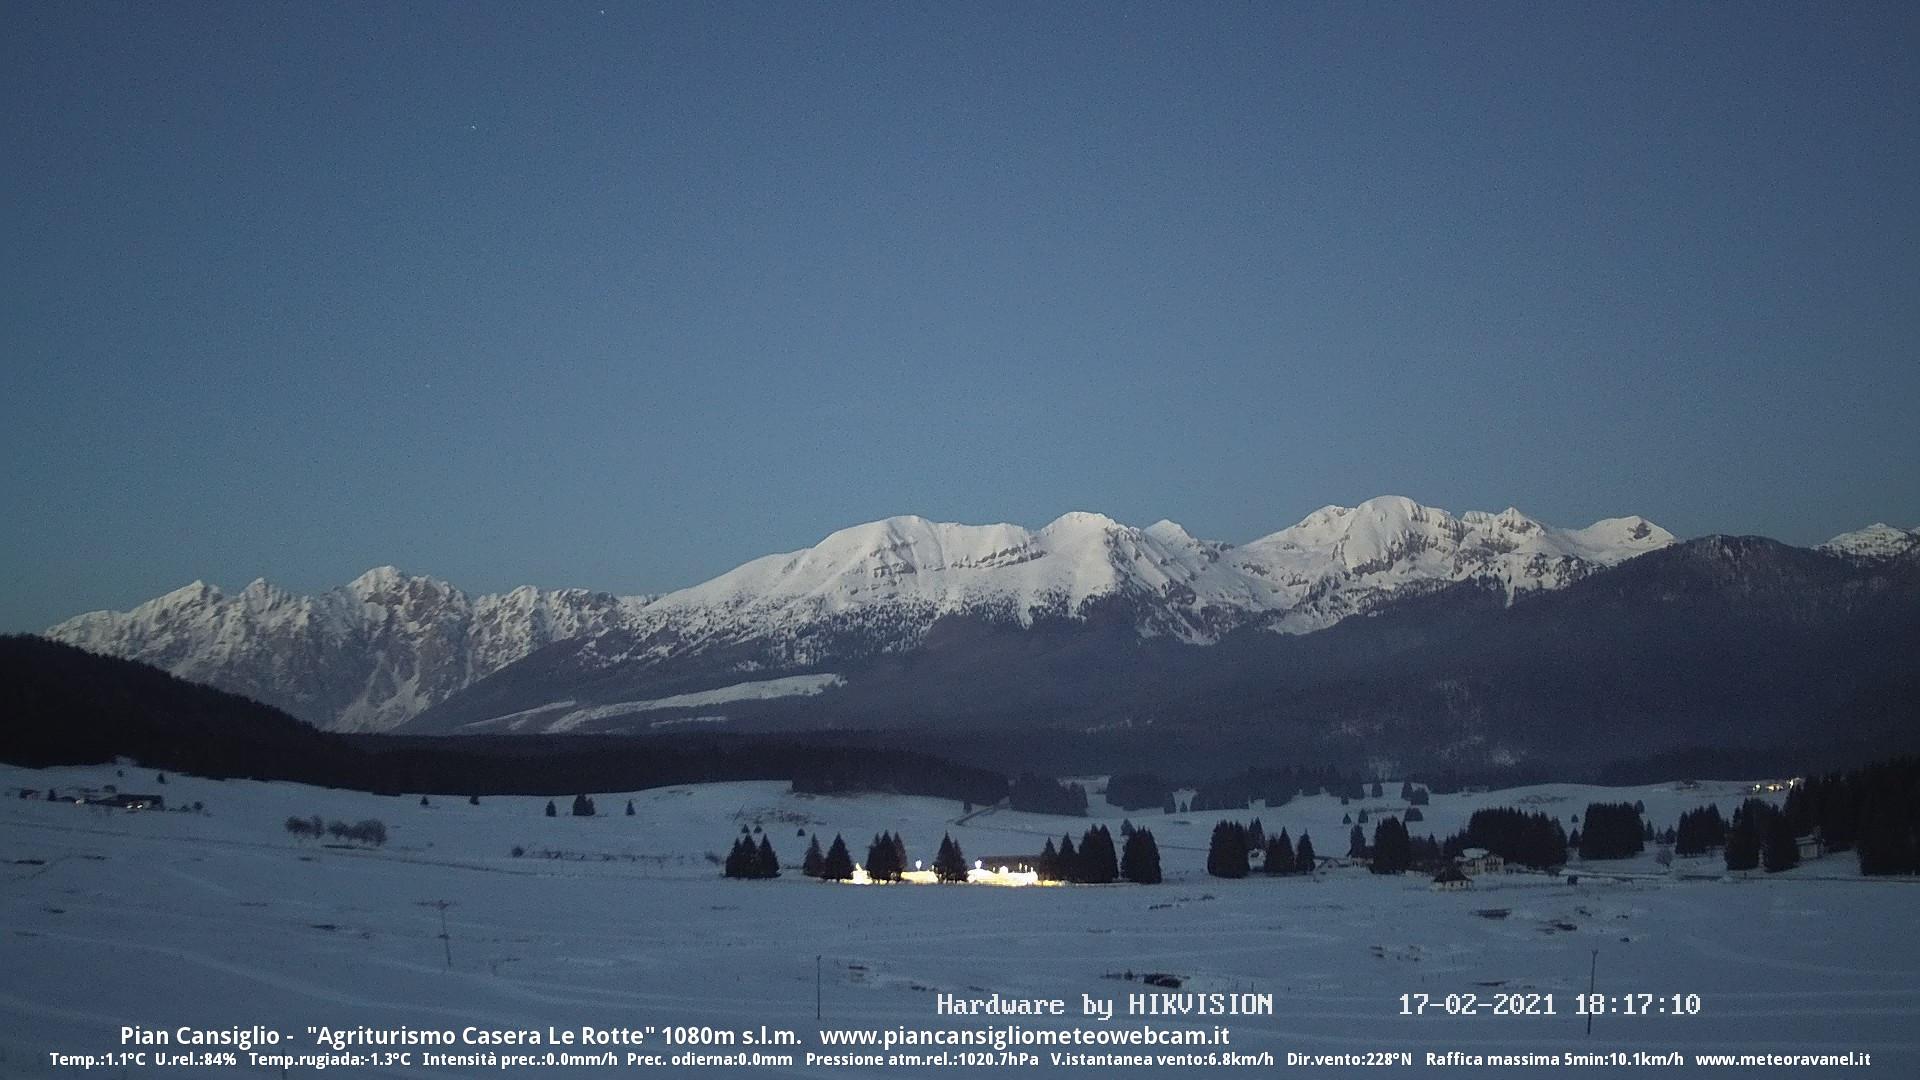 time-lapse frame, Discesa dal Guslon 17.02.2021 webcam